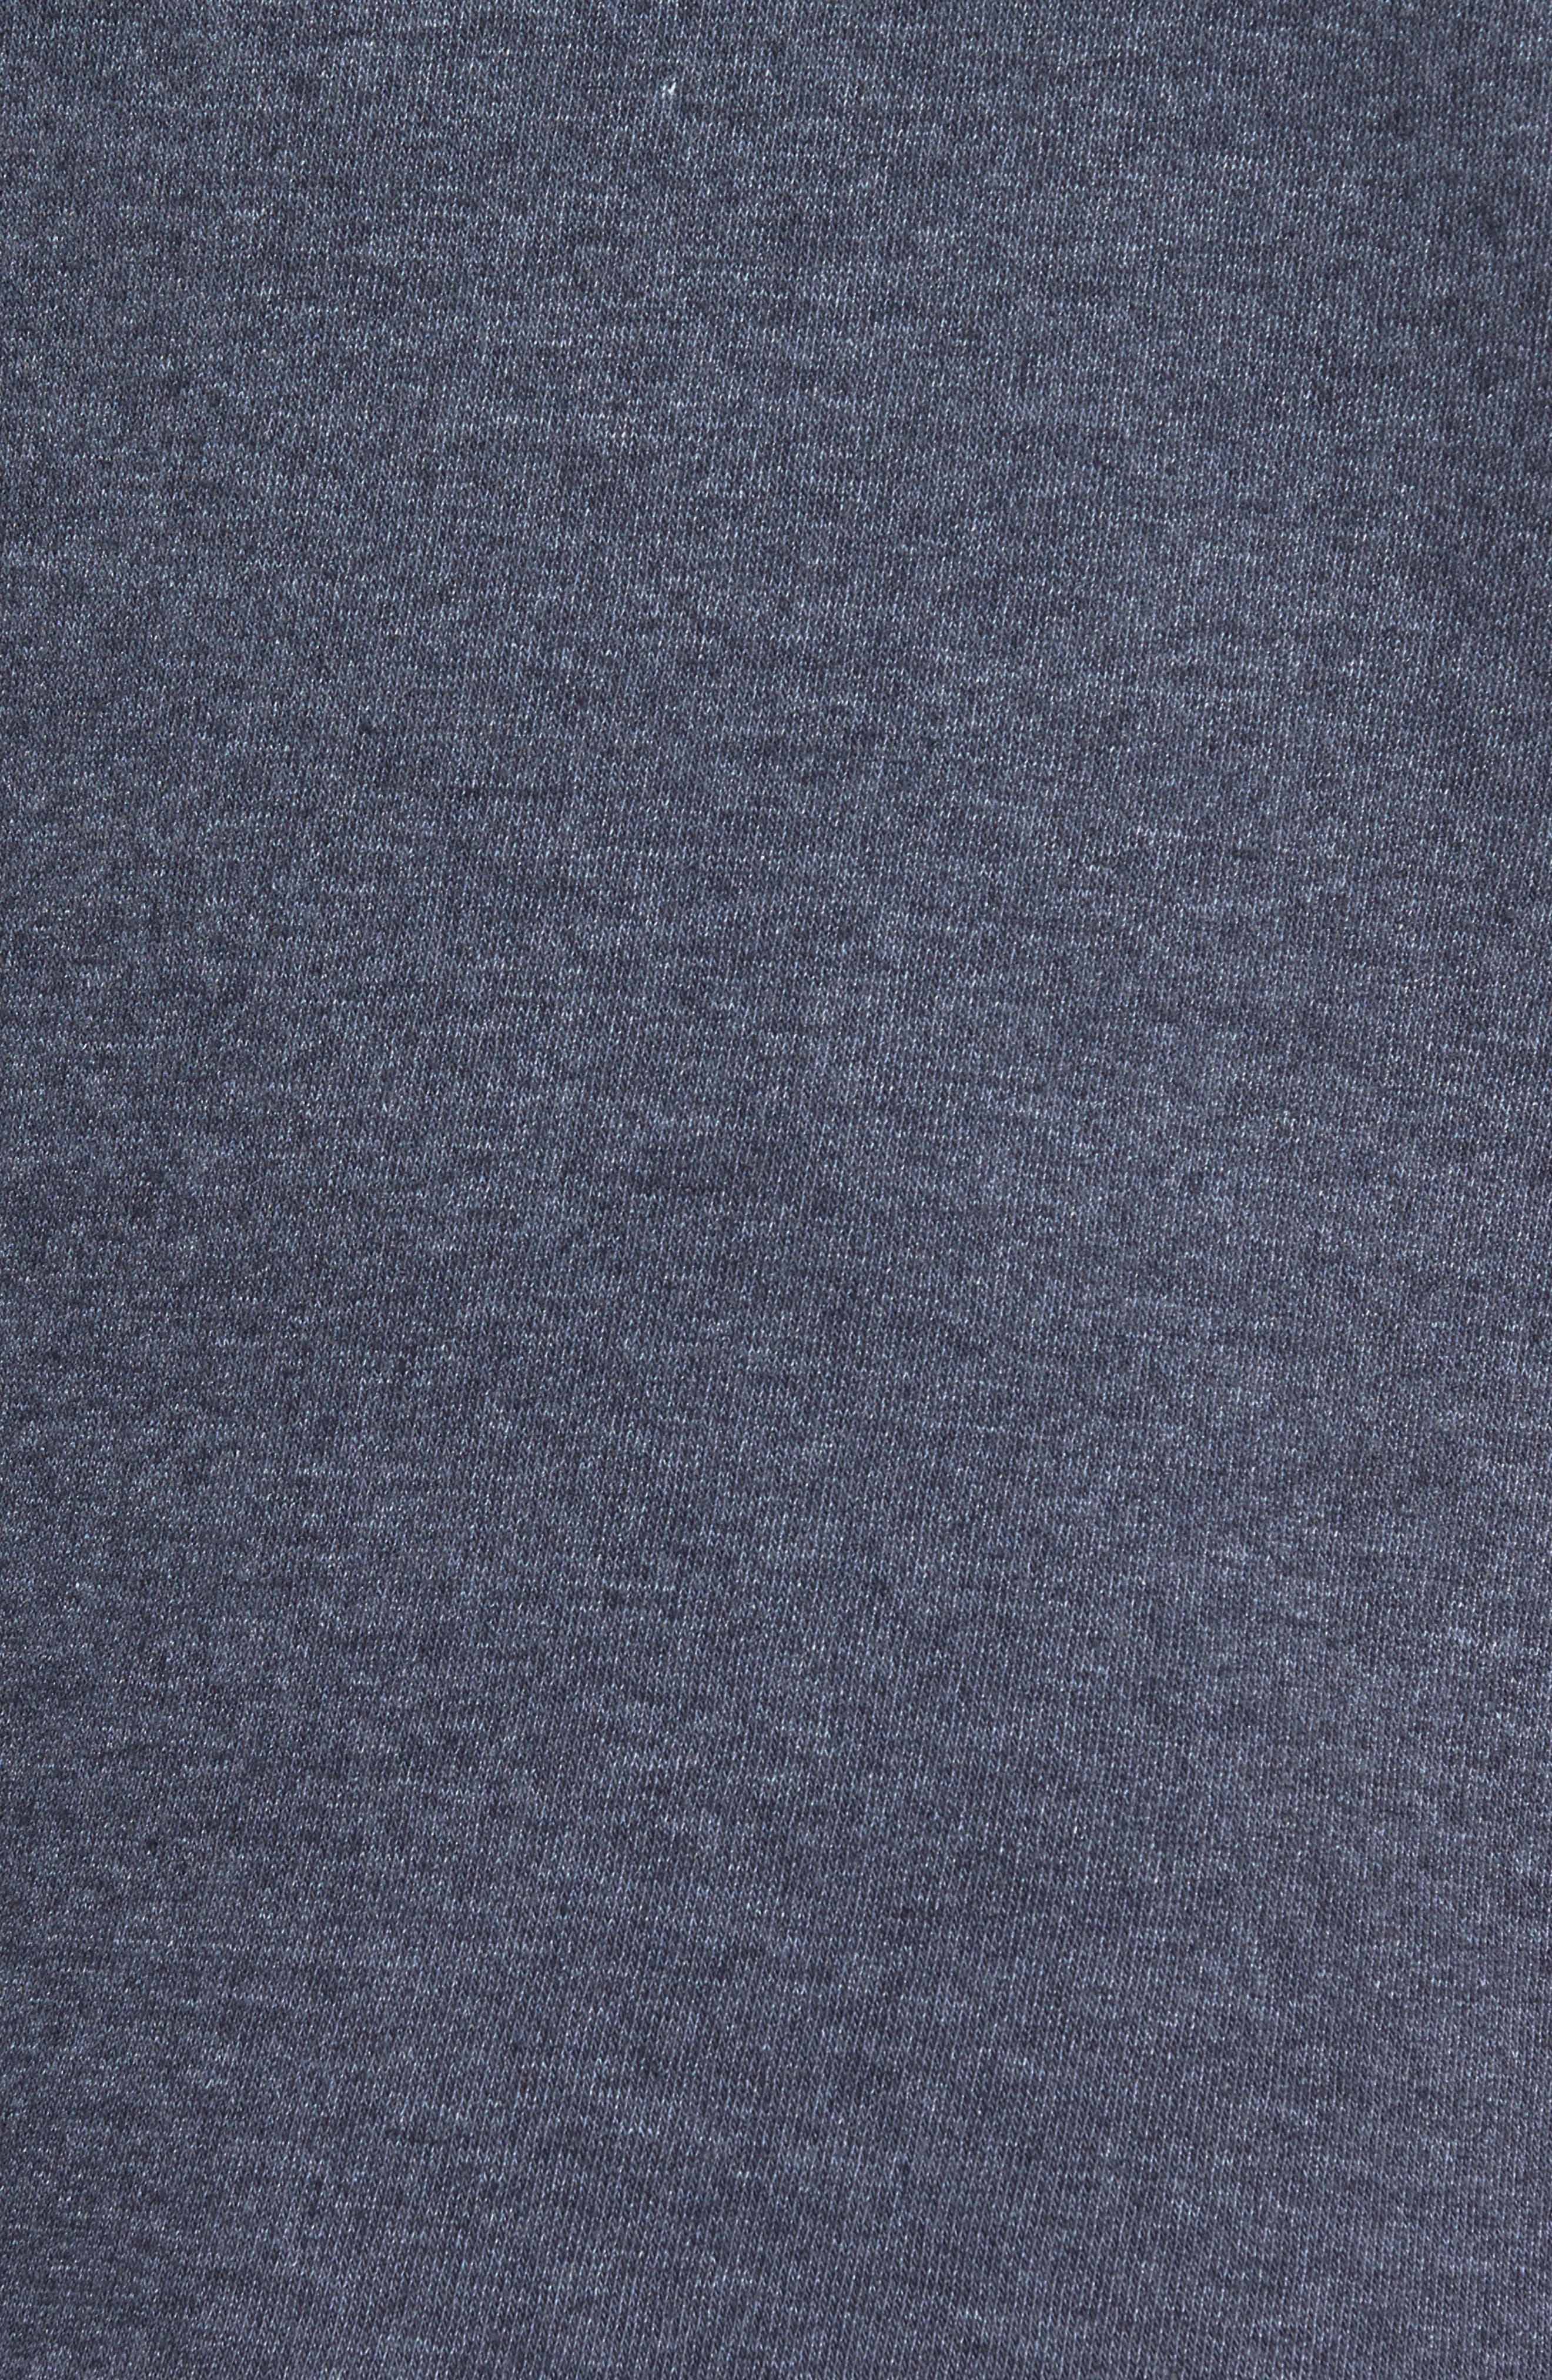 'Kale' Raglan Sweatshirt,                             Alternate thumbnail 6, color,                             410